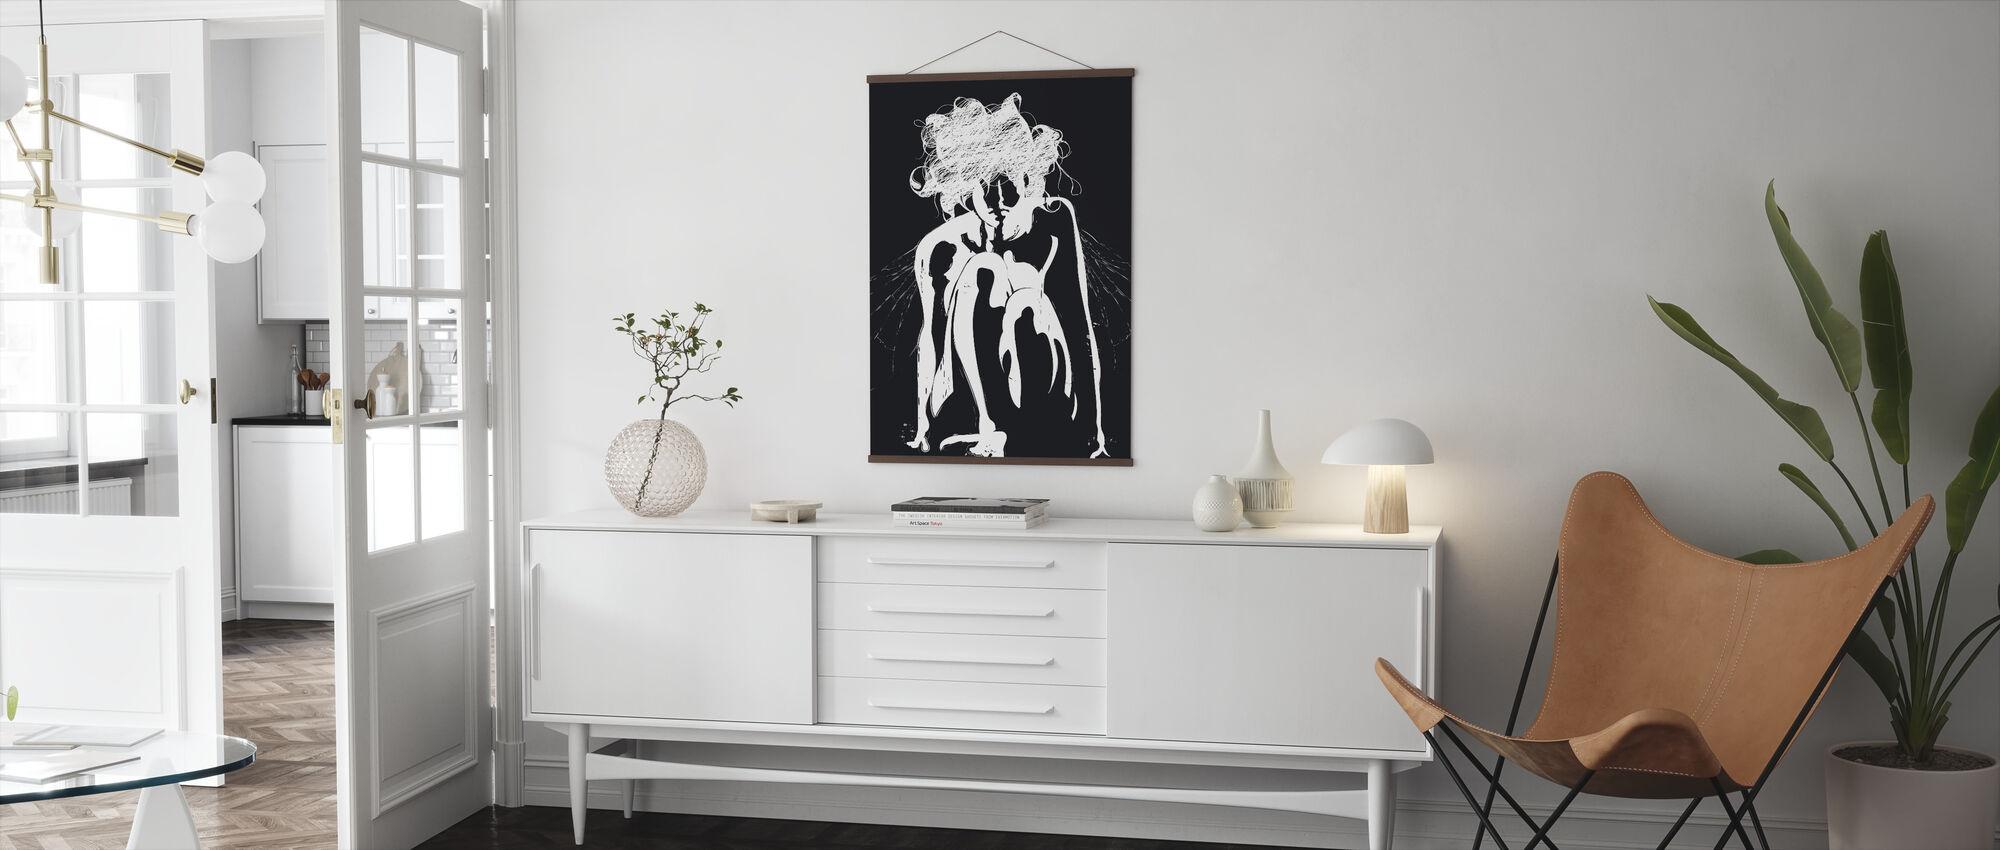 Tinker - Black - Poster - Living Room